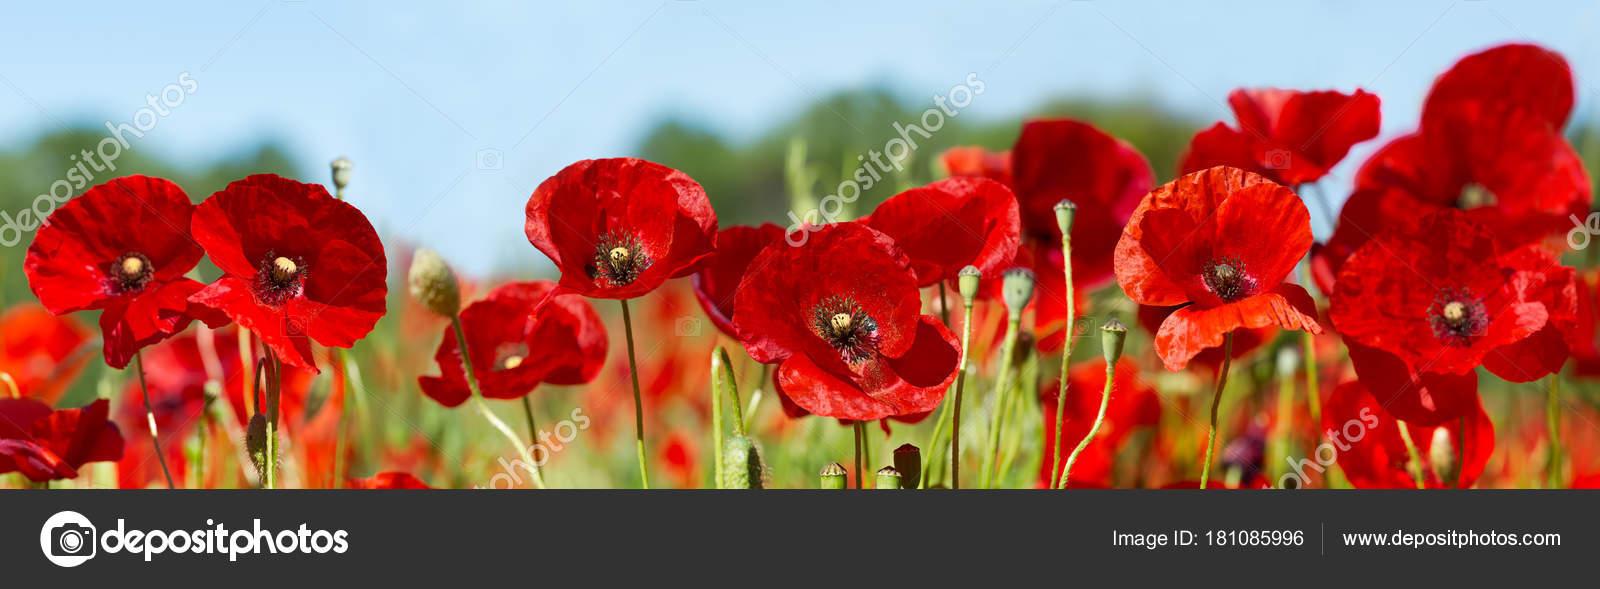 Red Poppy Flowers In A Field Stock Photo Nitrub 181085996